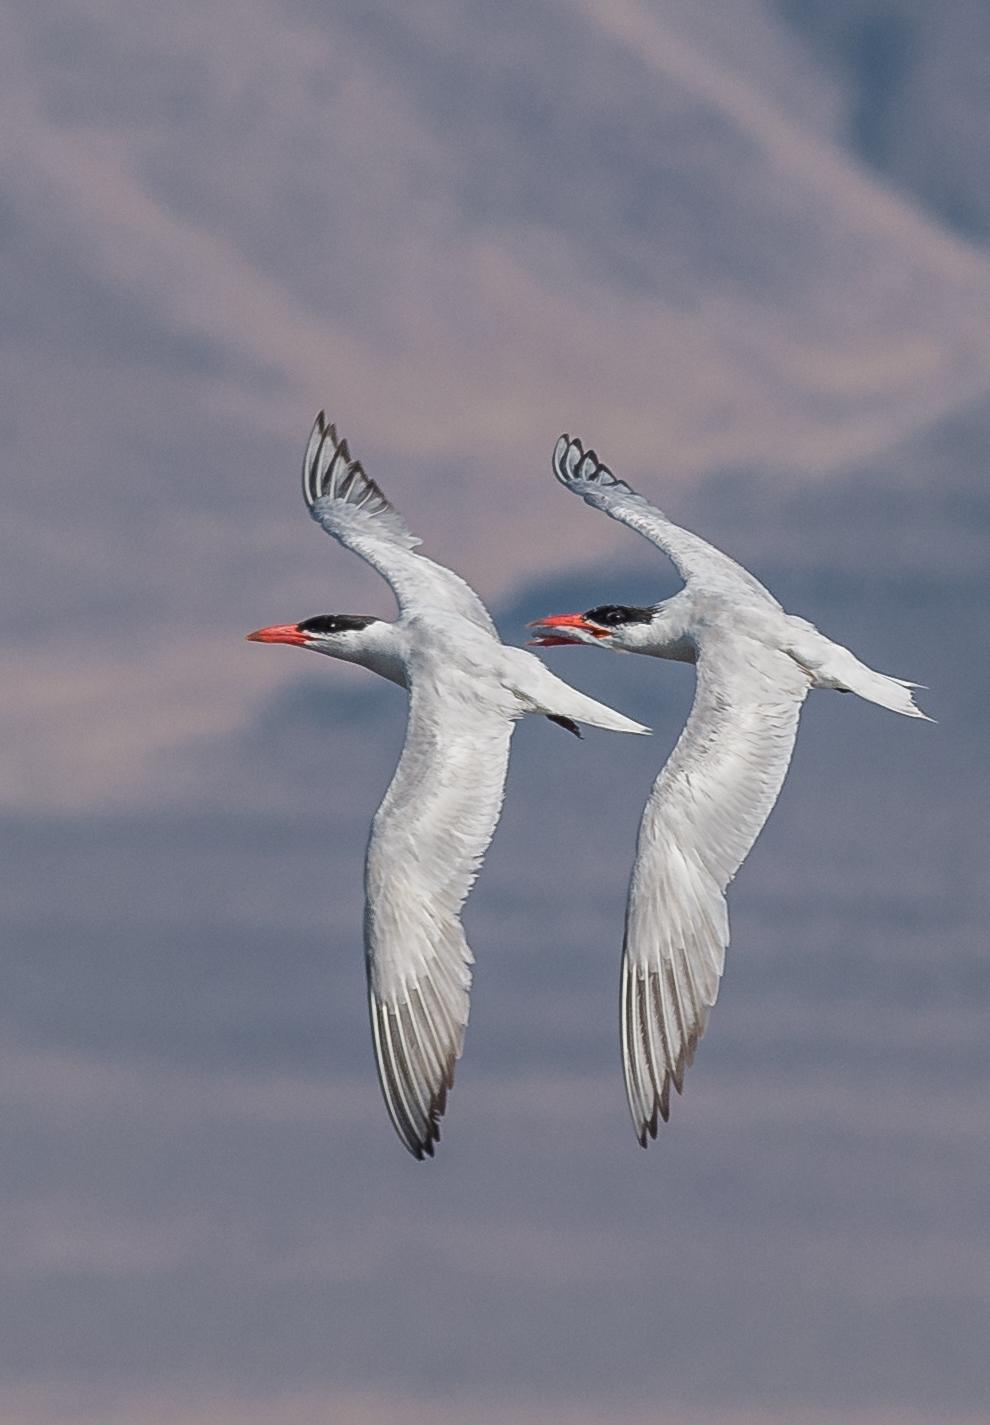 Caspian Terns pair in Flight   Settings: 450 mm (eqiv), 1/1600s, f/5.6, ISO280, +1/3EV